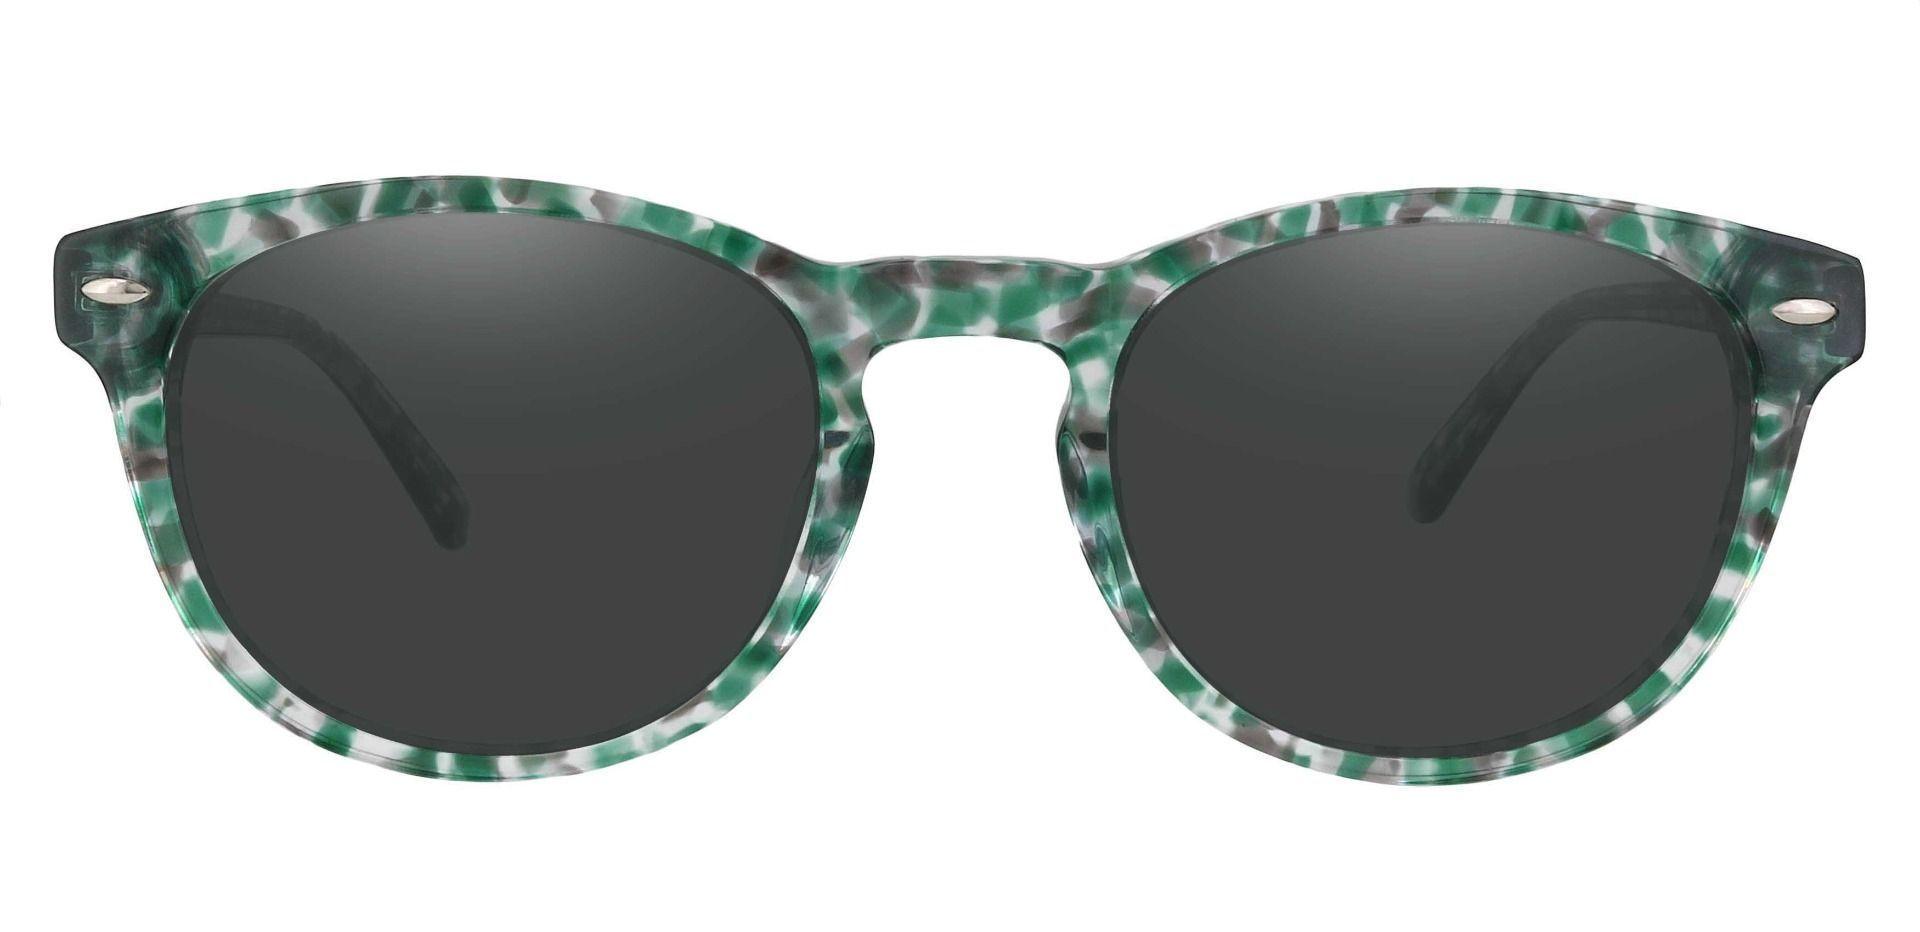 Laguna Oval Reading Sunglasses - Green Frame With Gray Lenses